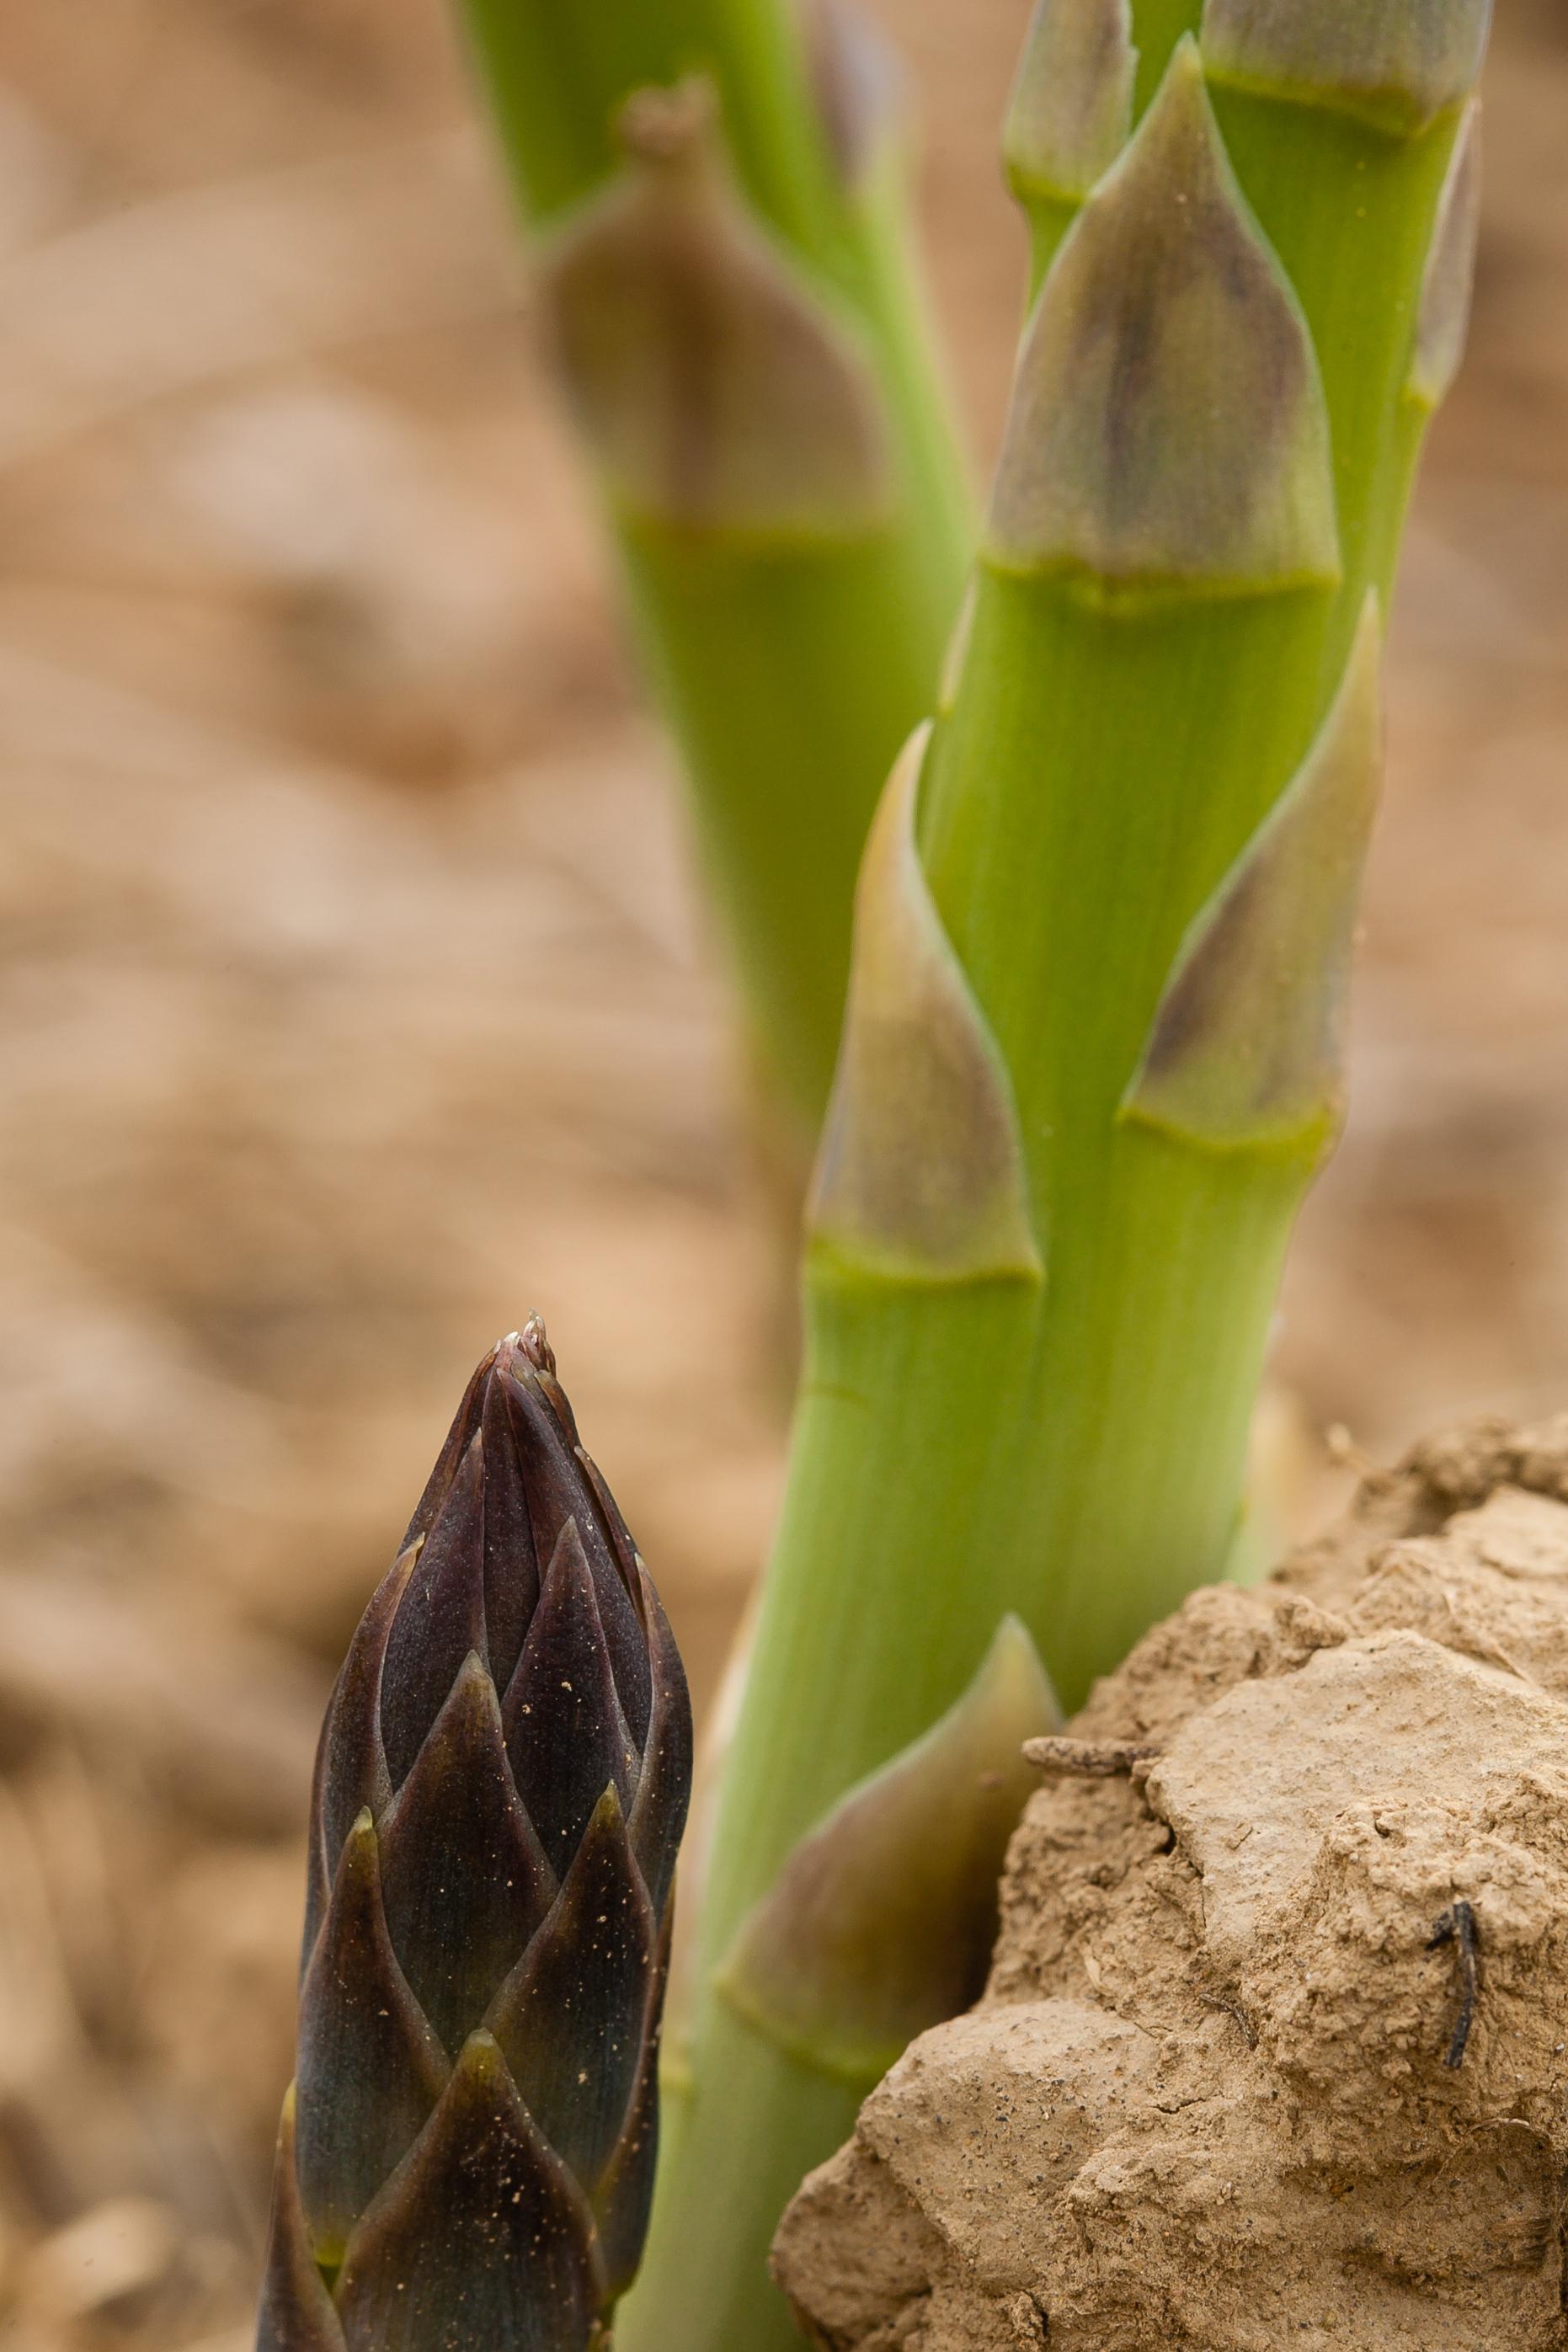 Asparagus_in_Field_29